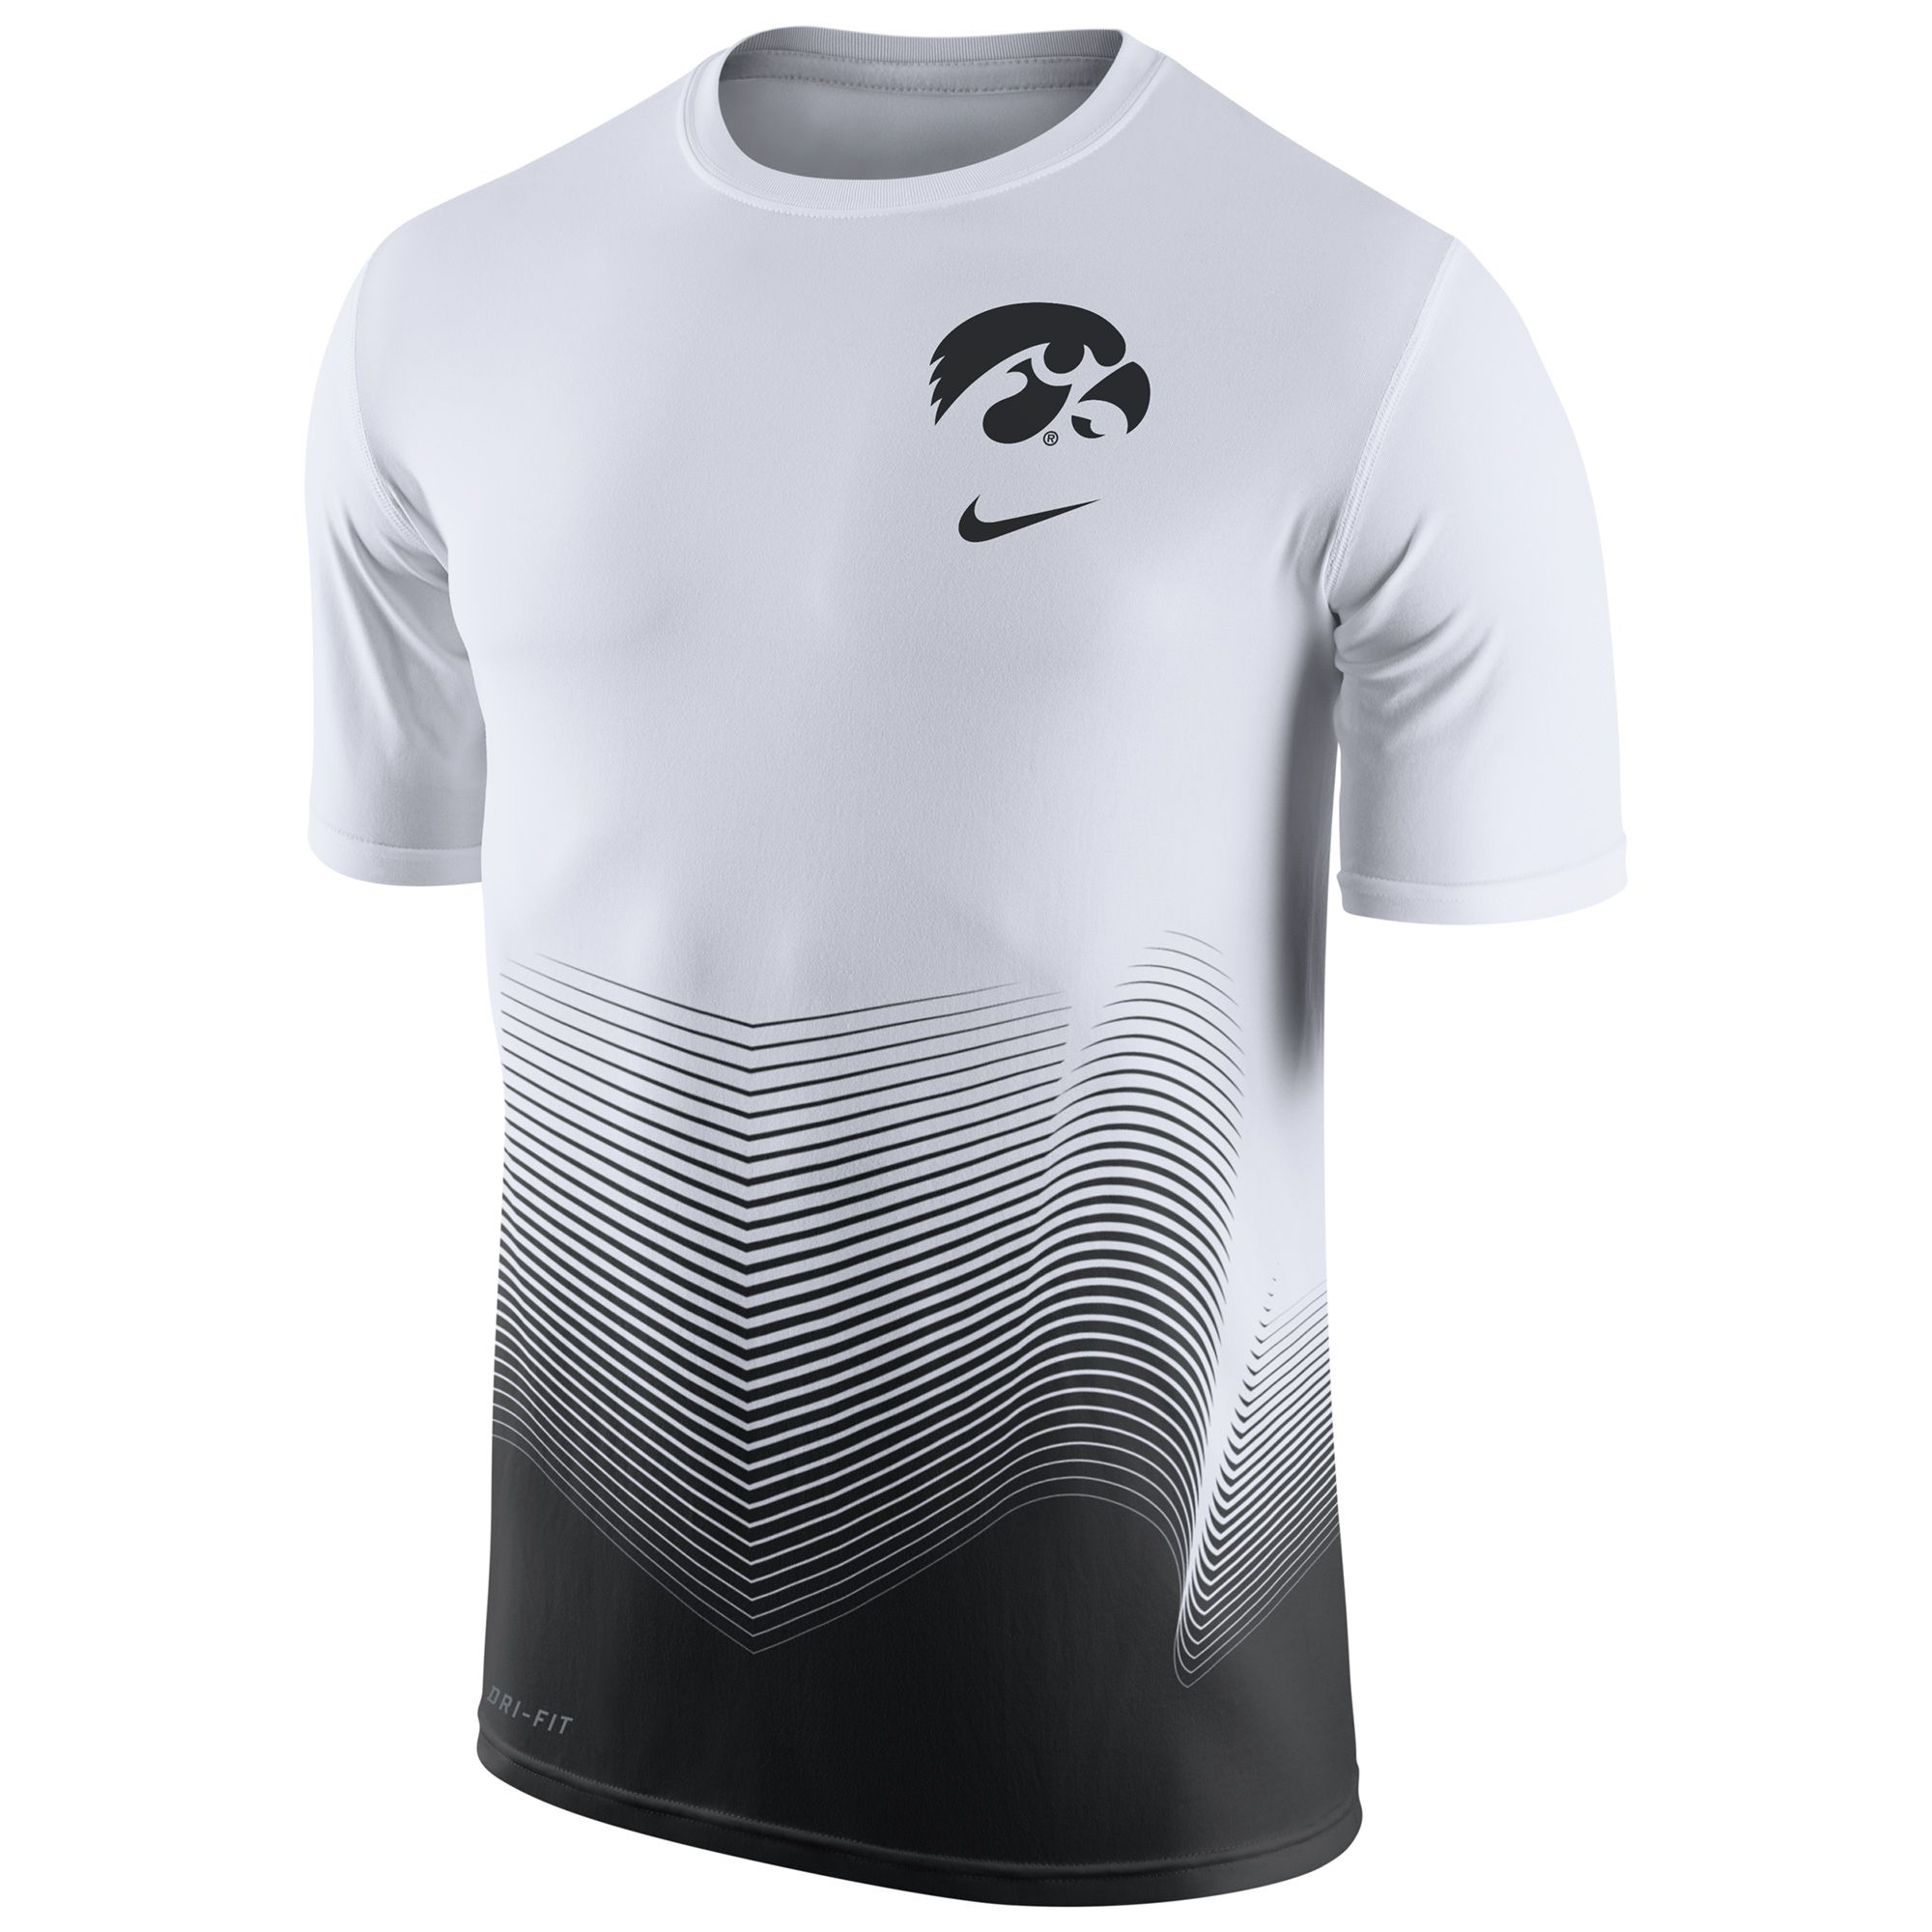 Basquetebol Camisetas · College Iowa Hawkeyes Nike 2016 Basketball  Disruption Player Dri-FIT T-Shirt - White d34c89fe4fb69